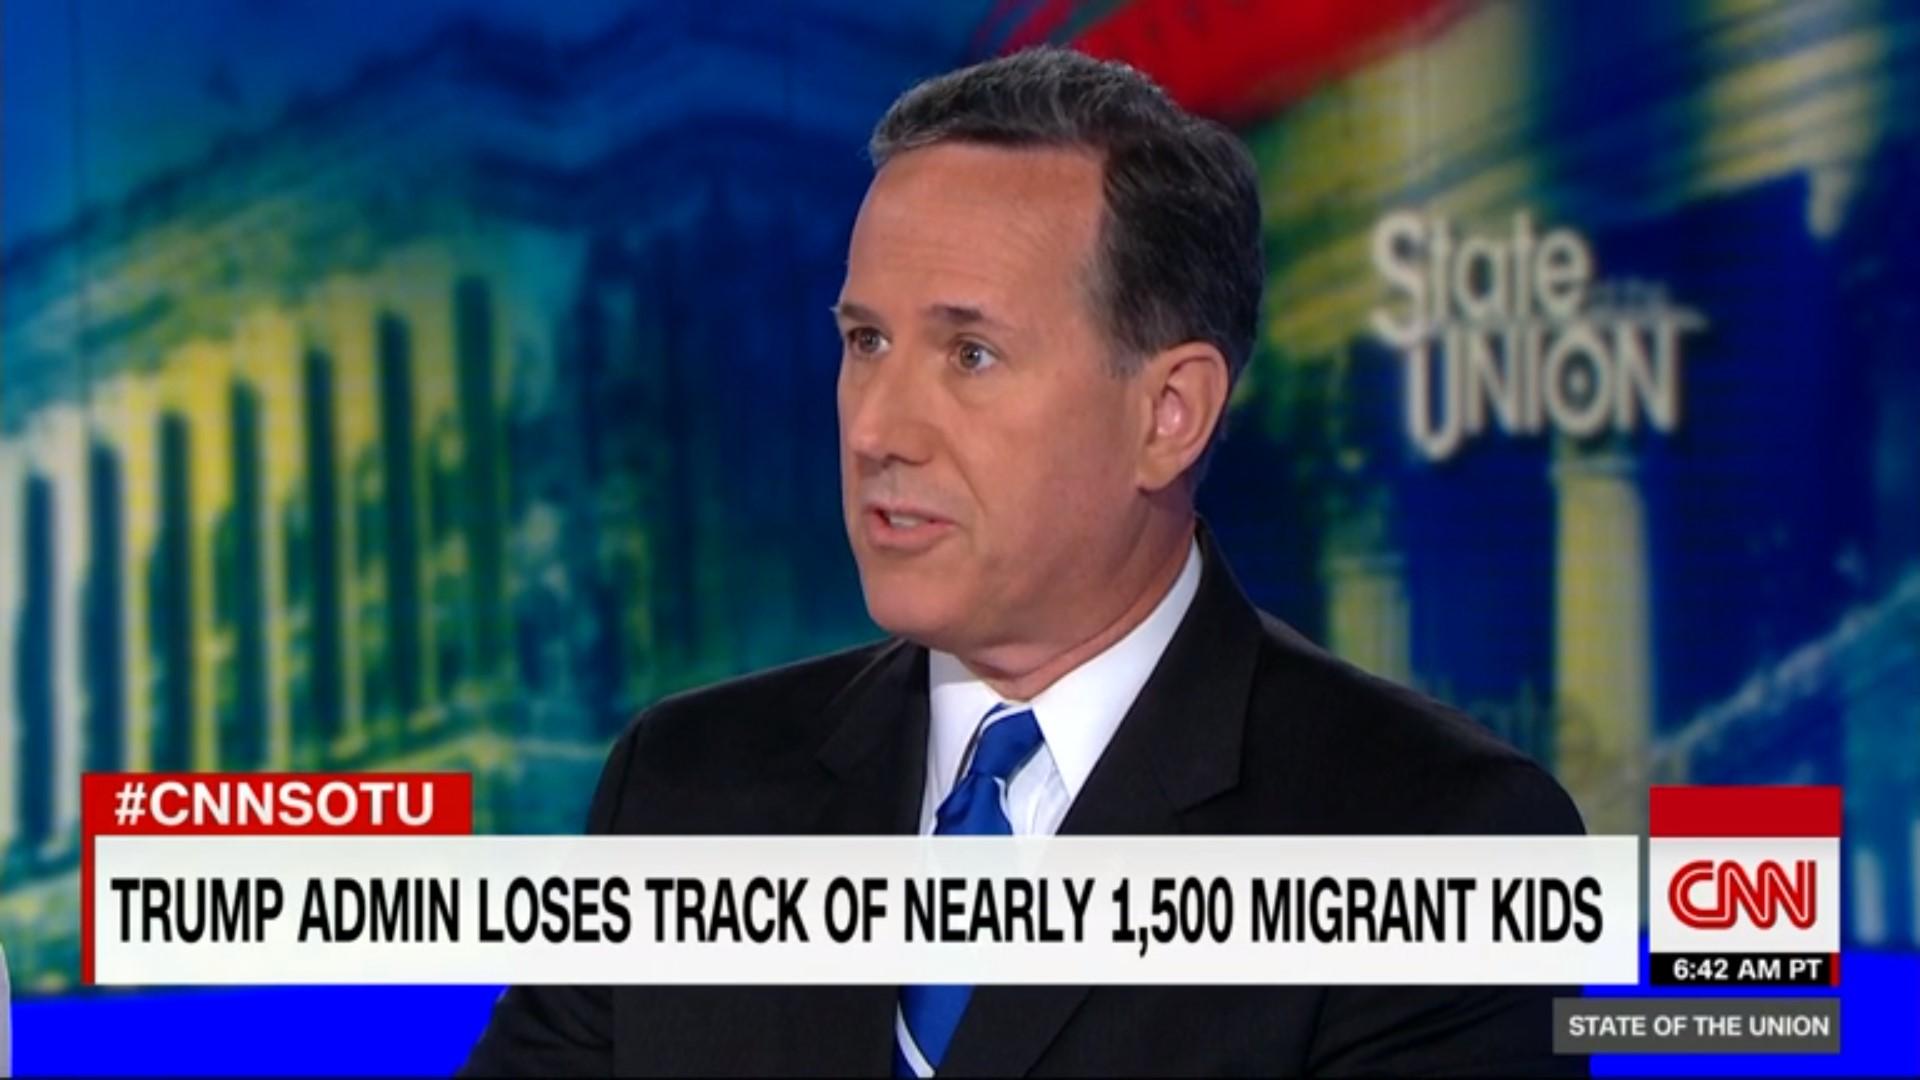 Liberals Tear Into Rick Santorum After He Defends Trump Admin For Losing 1,500 Migrant Children